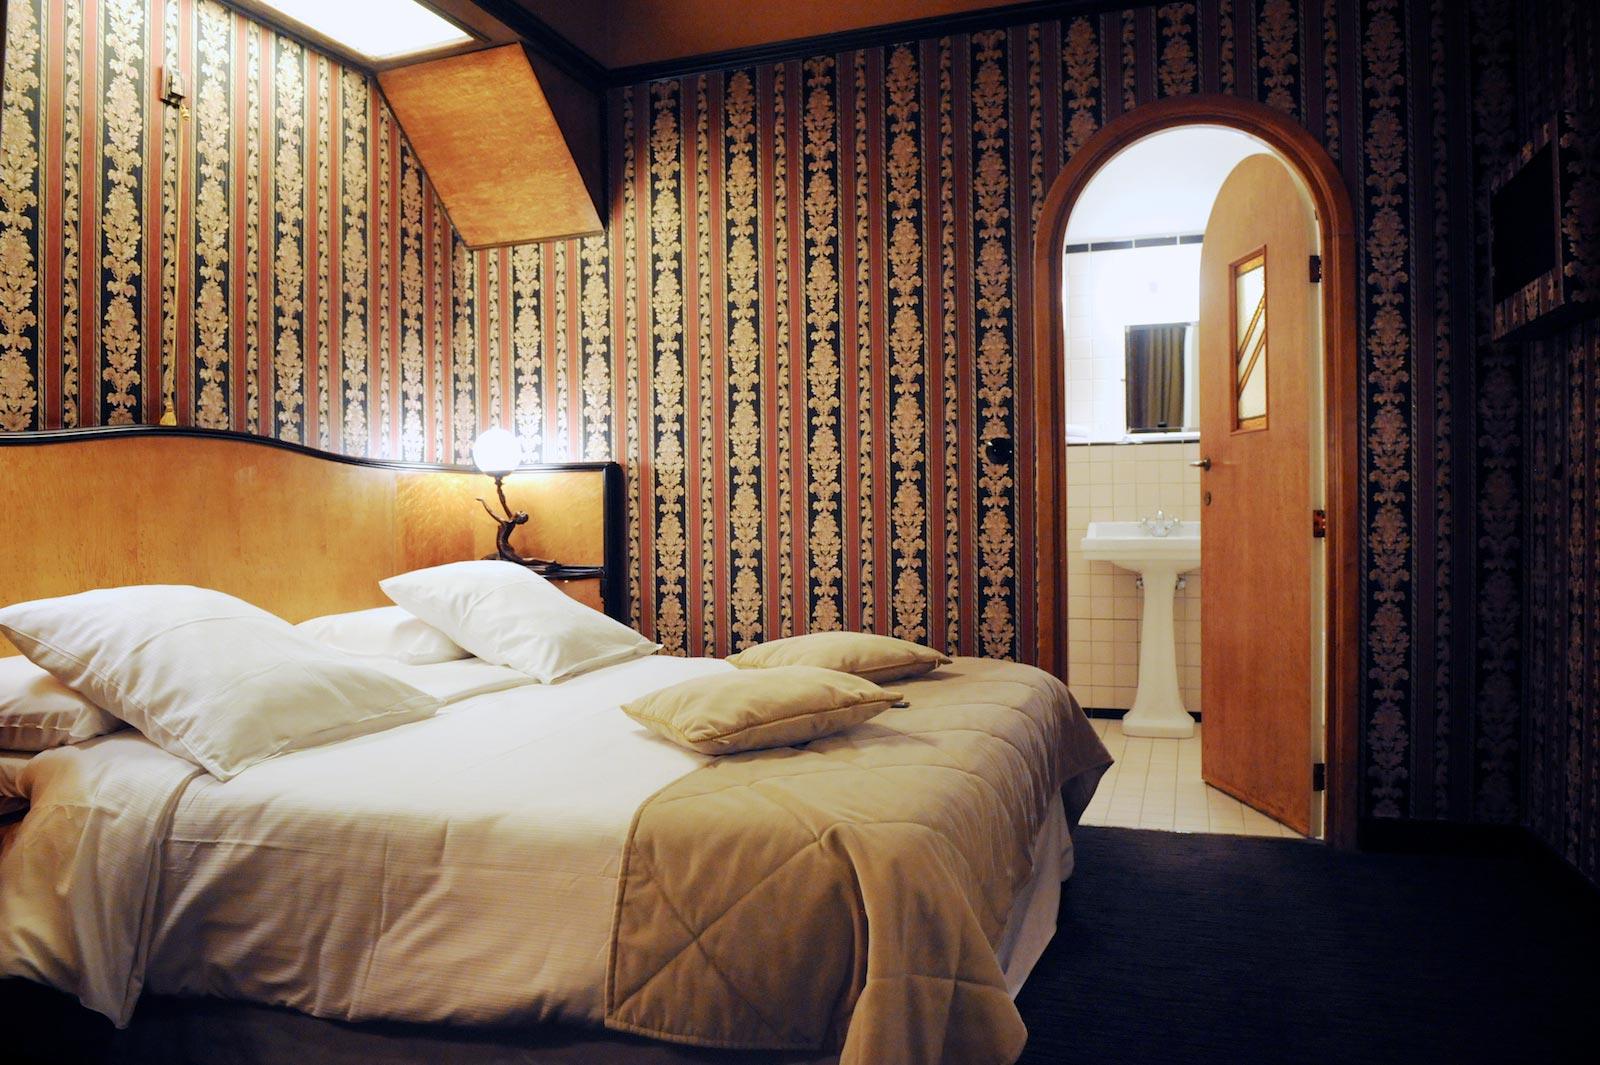 hotel-le-berger- rooms-superieur-antoinette-07-02.jpg